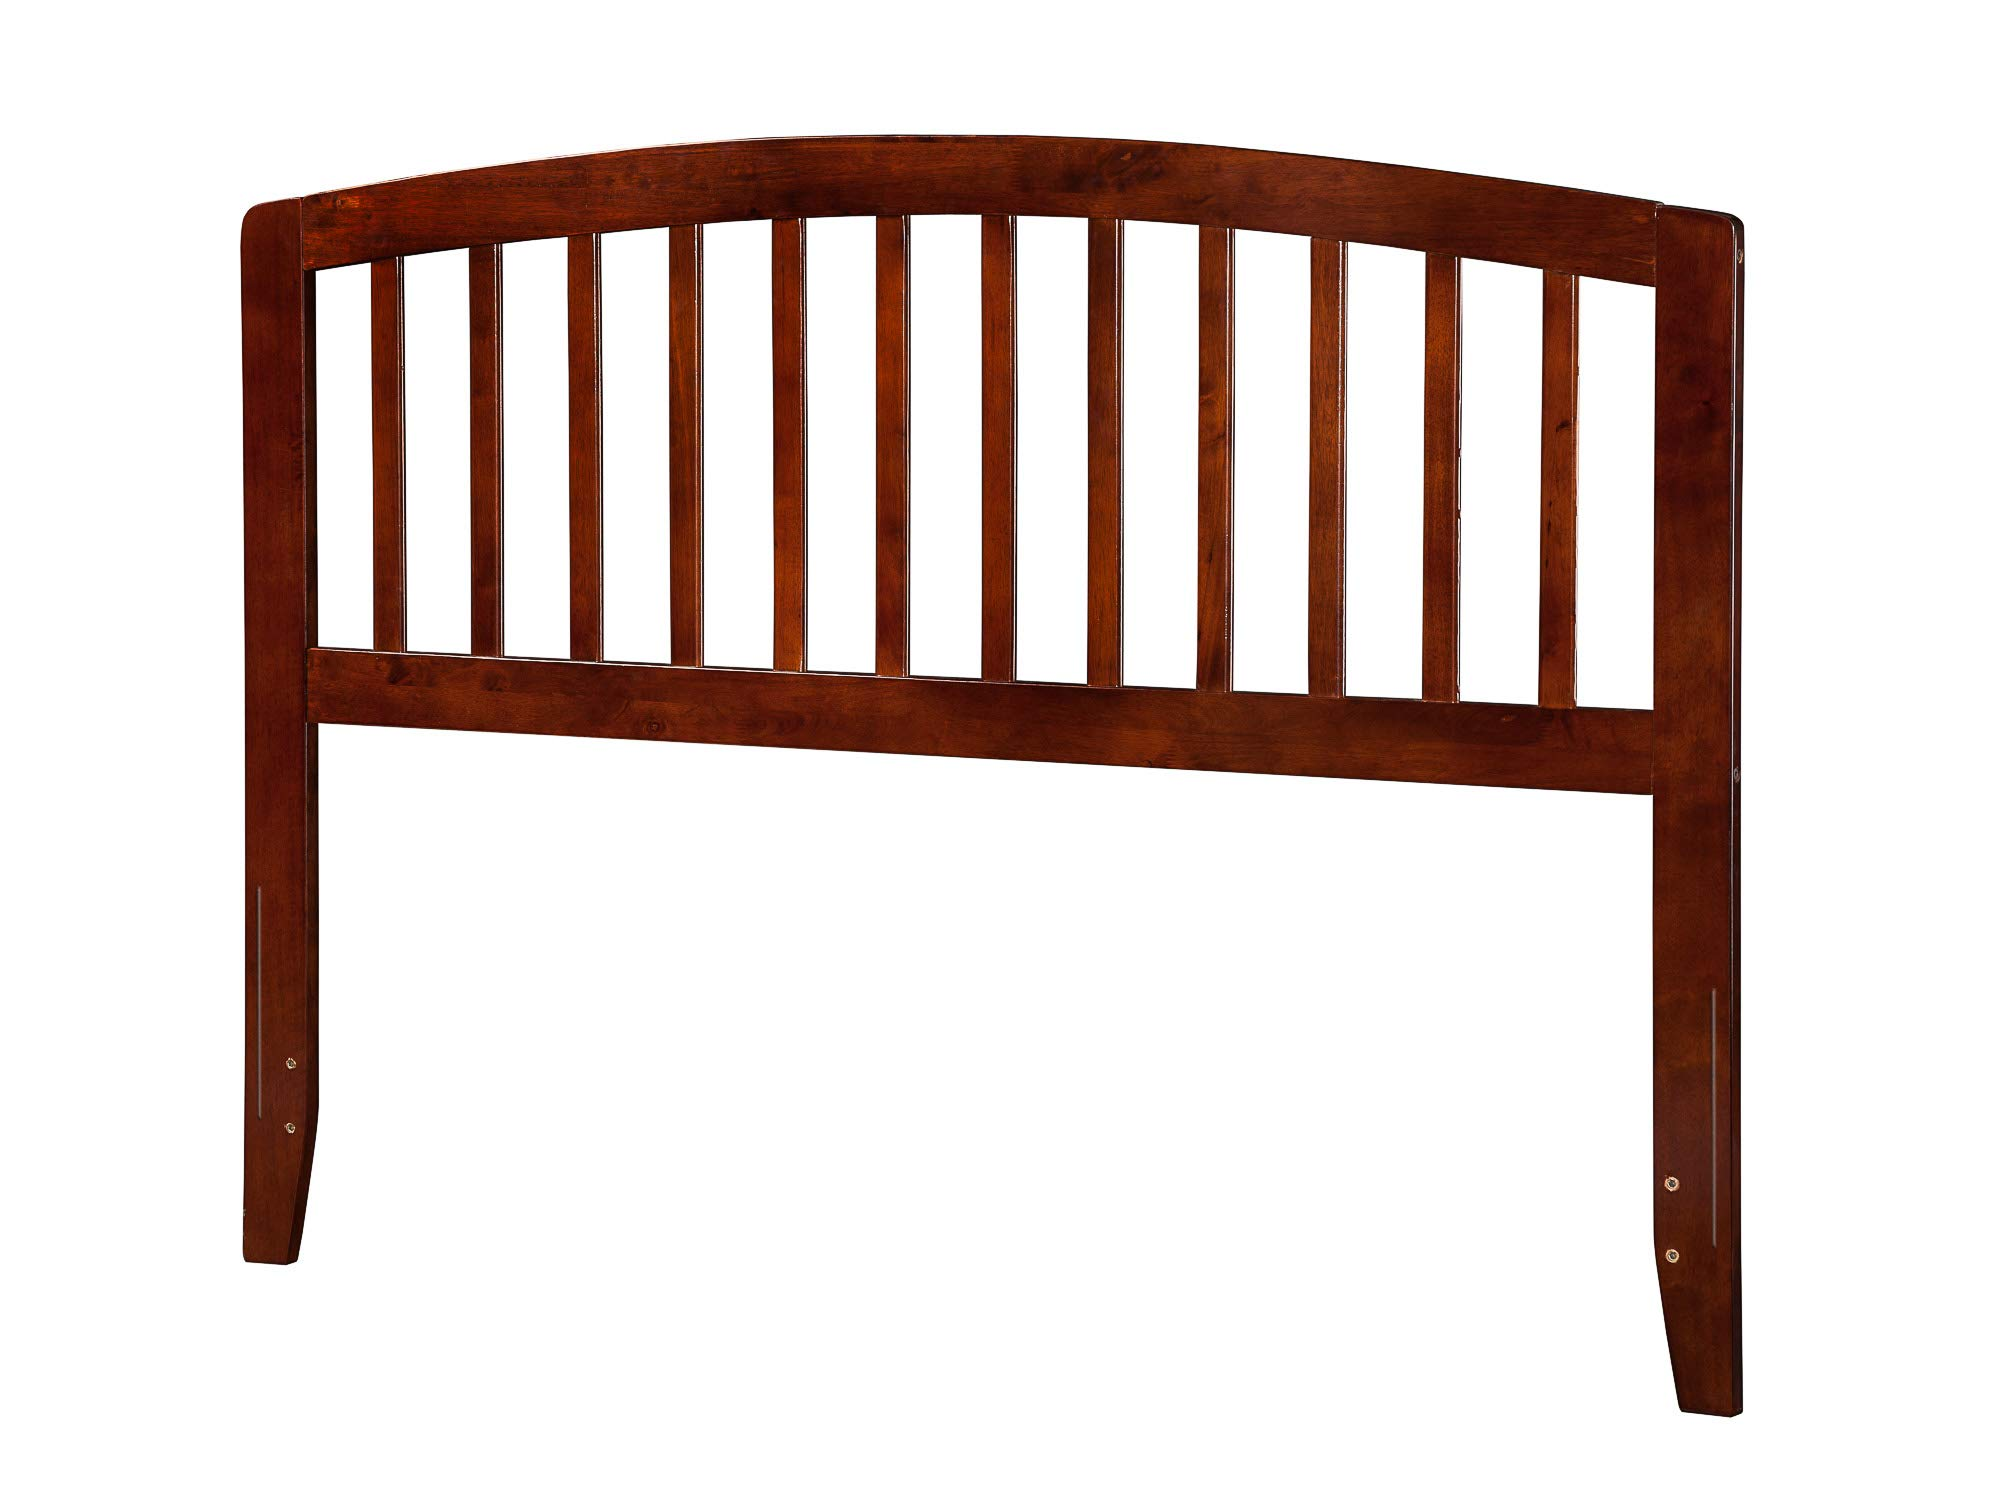 Atlantic Furniture AR288834 Richmond Headboard, Full, Walnut by Atlantic Furniture